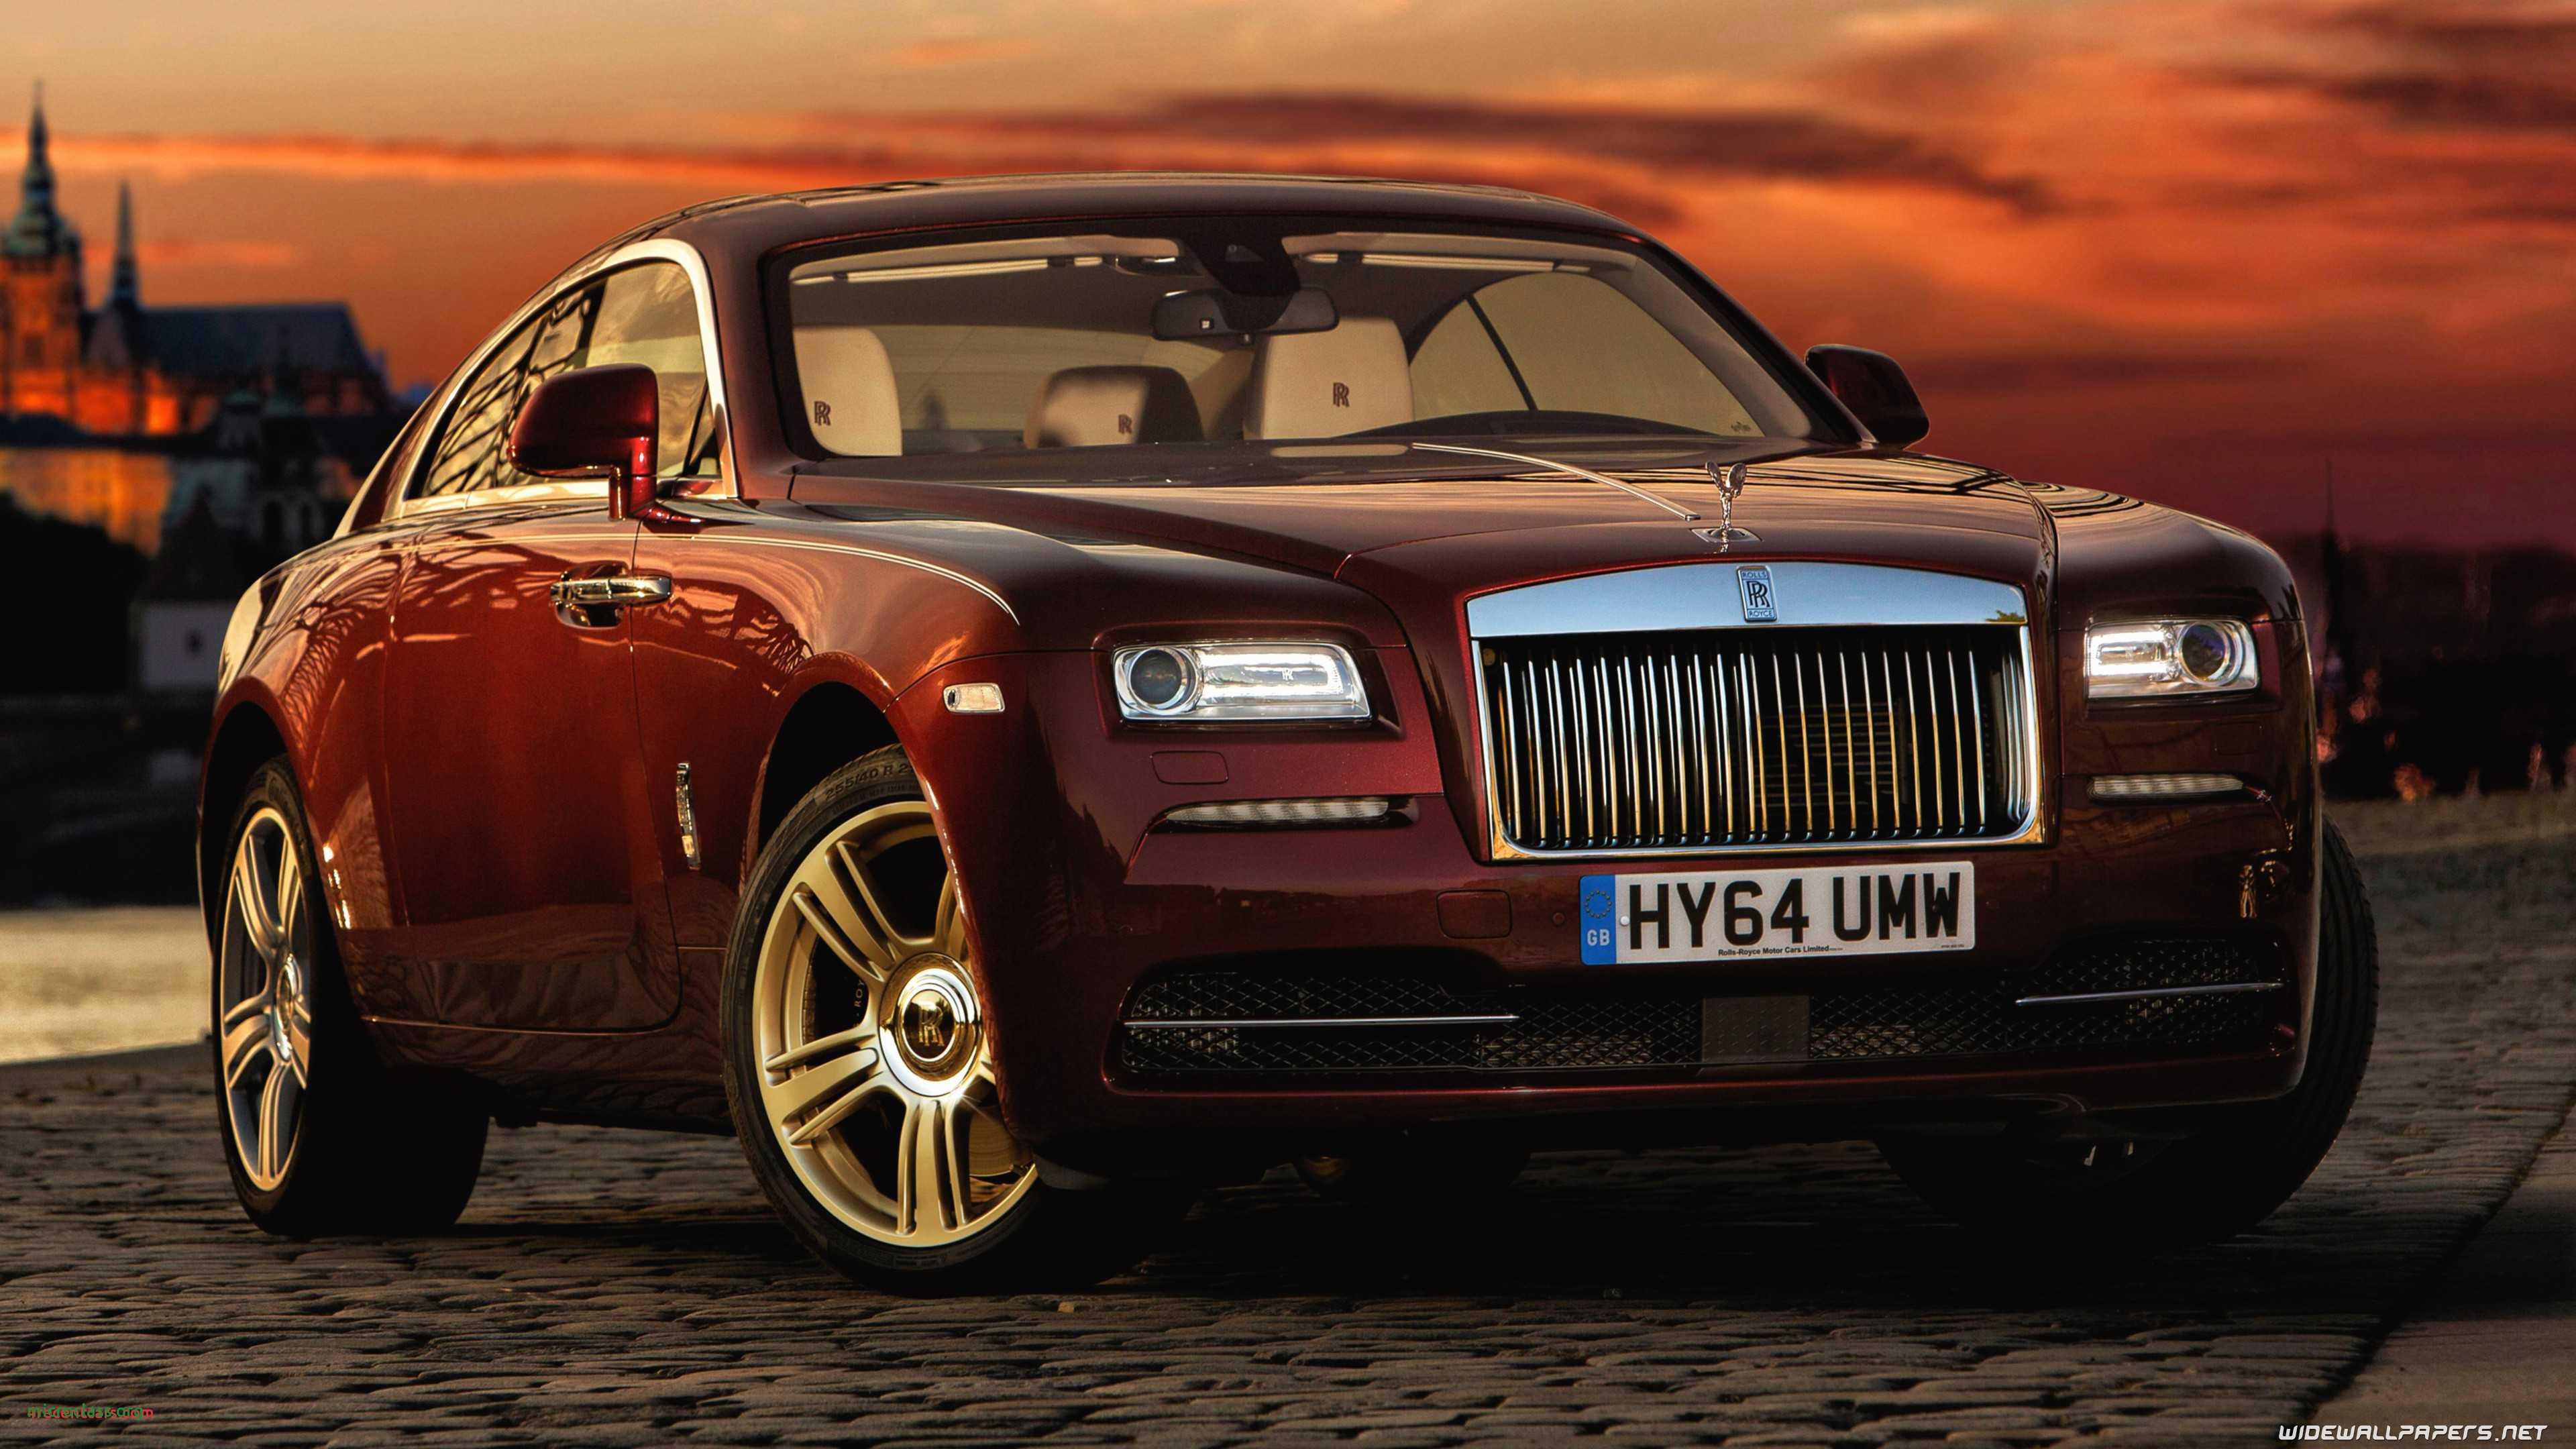 Rolls-Royce Car Wallpapers - Wallpaper Cave